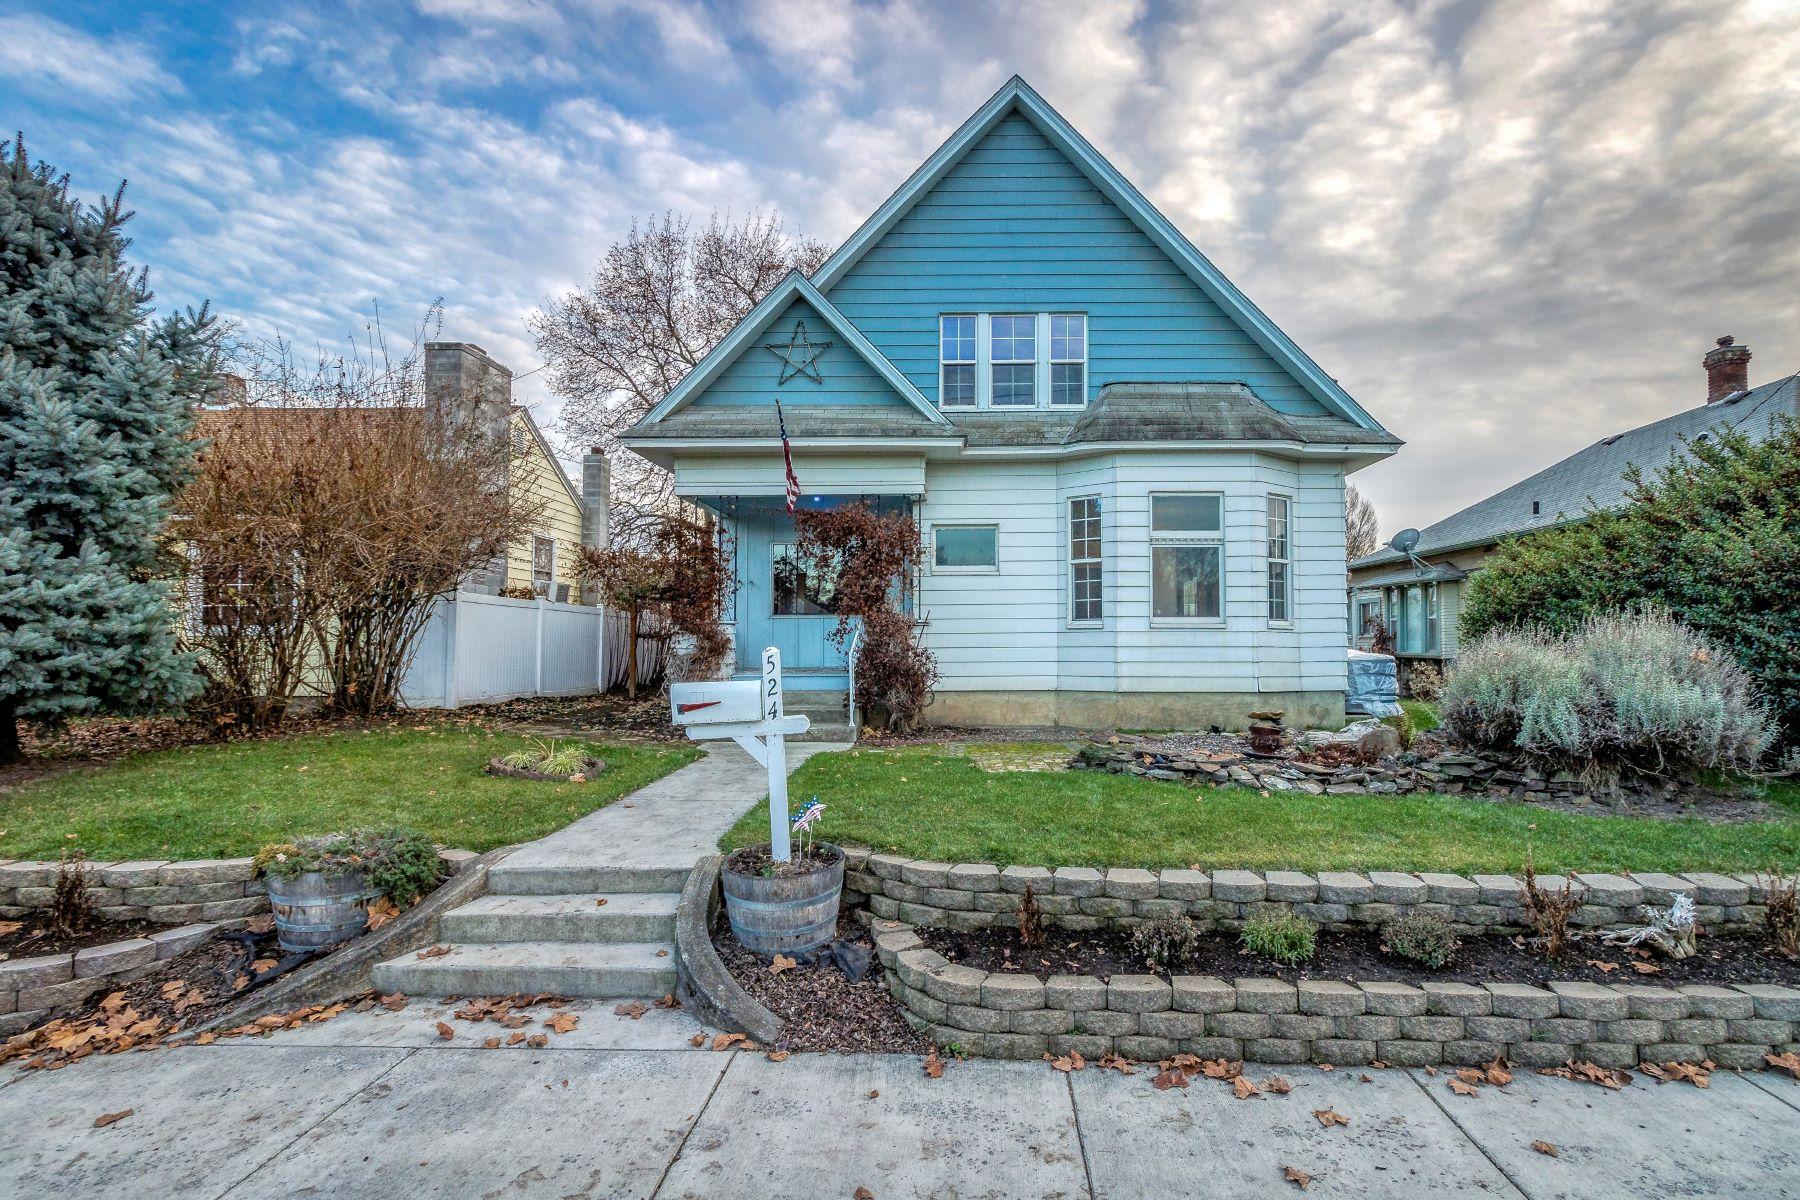 Single Family Homes for Sale at 524 E. Chestnut St 524 E Chestnut St Walla Walla, Washington 99362 United States